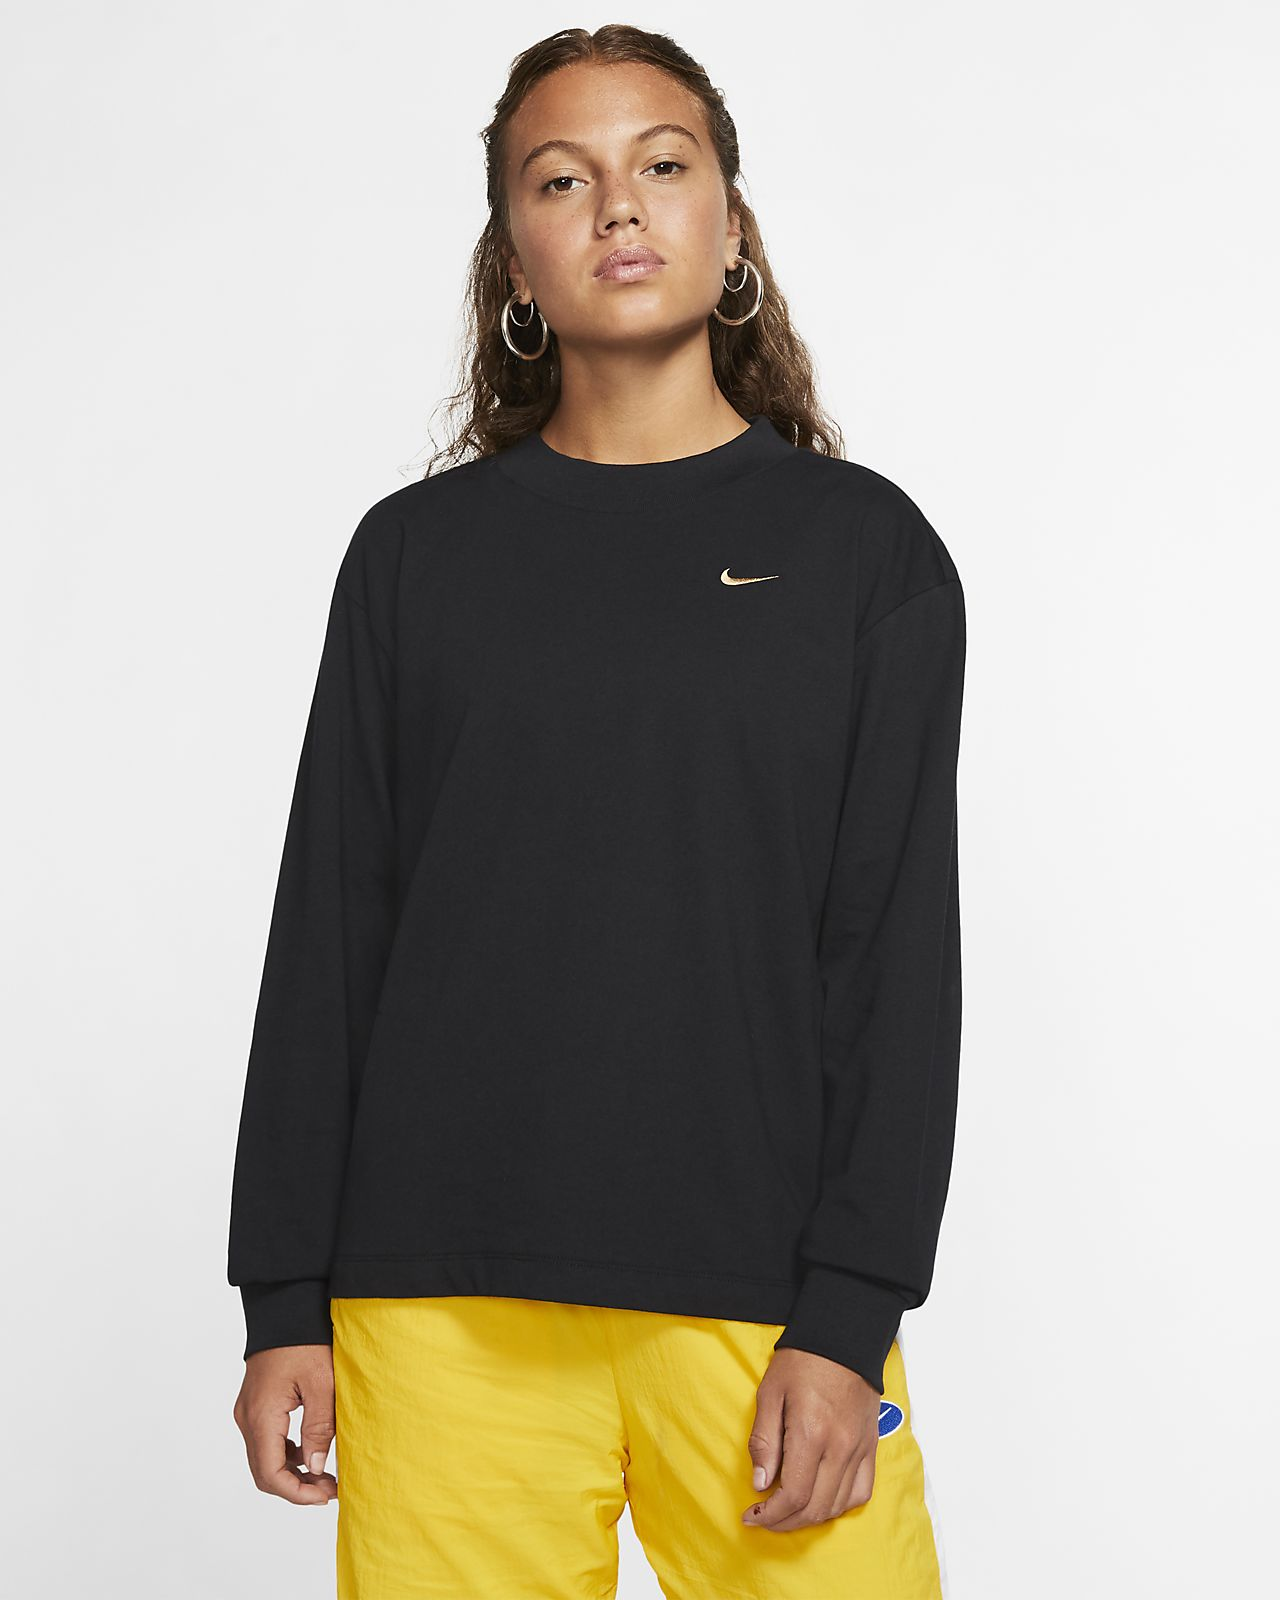 Dámské tričko s dlouhým rukávem Nike Sportswear Essential